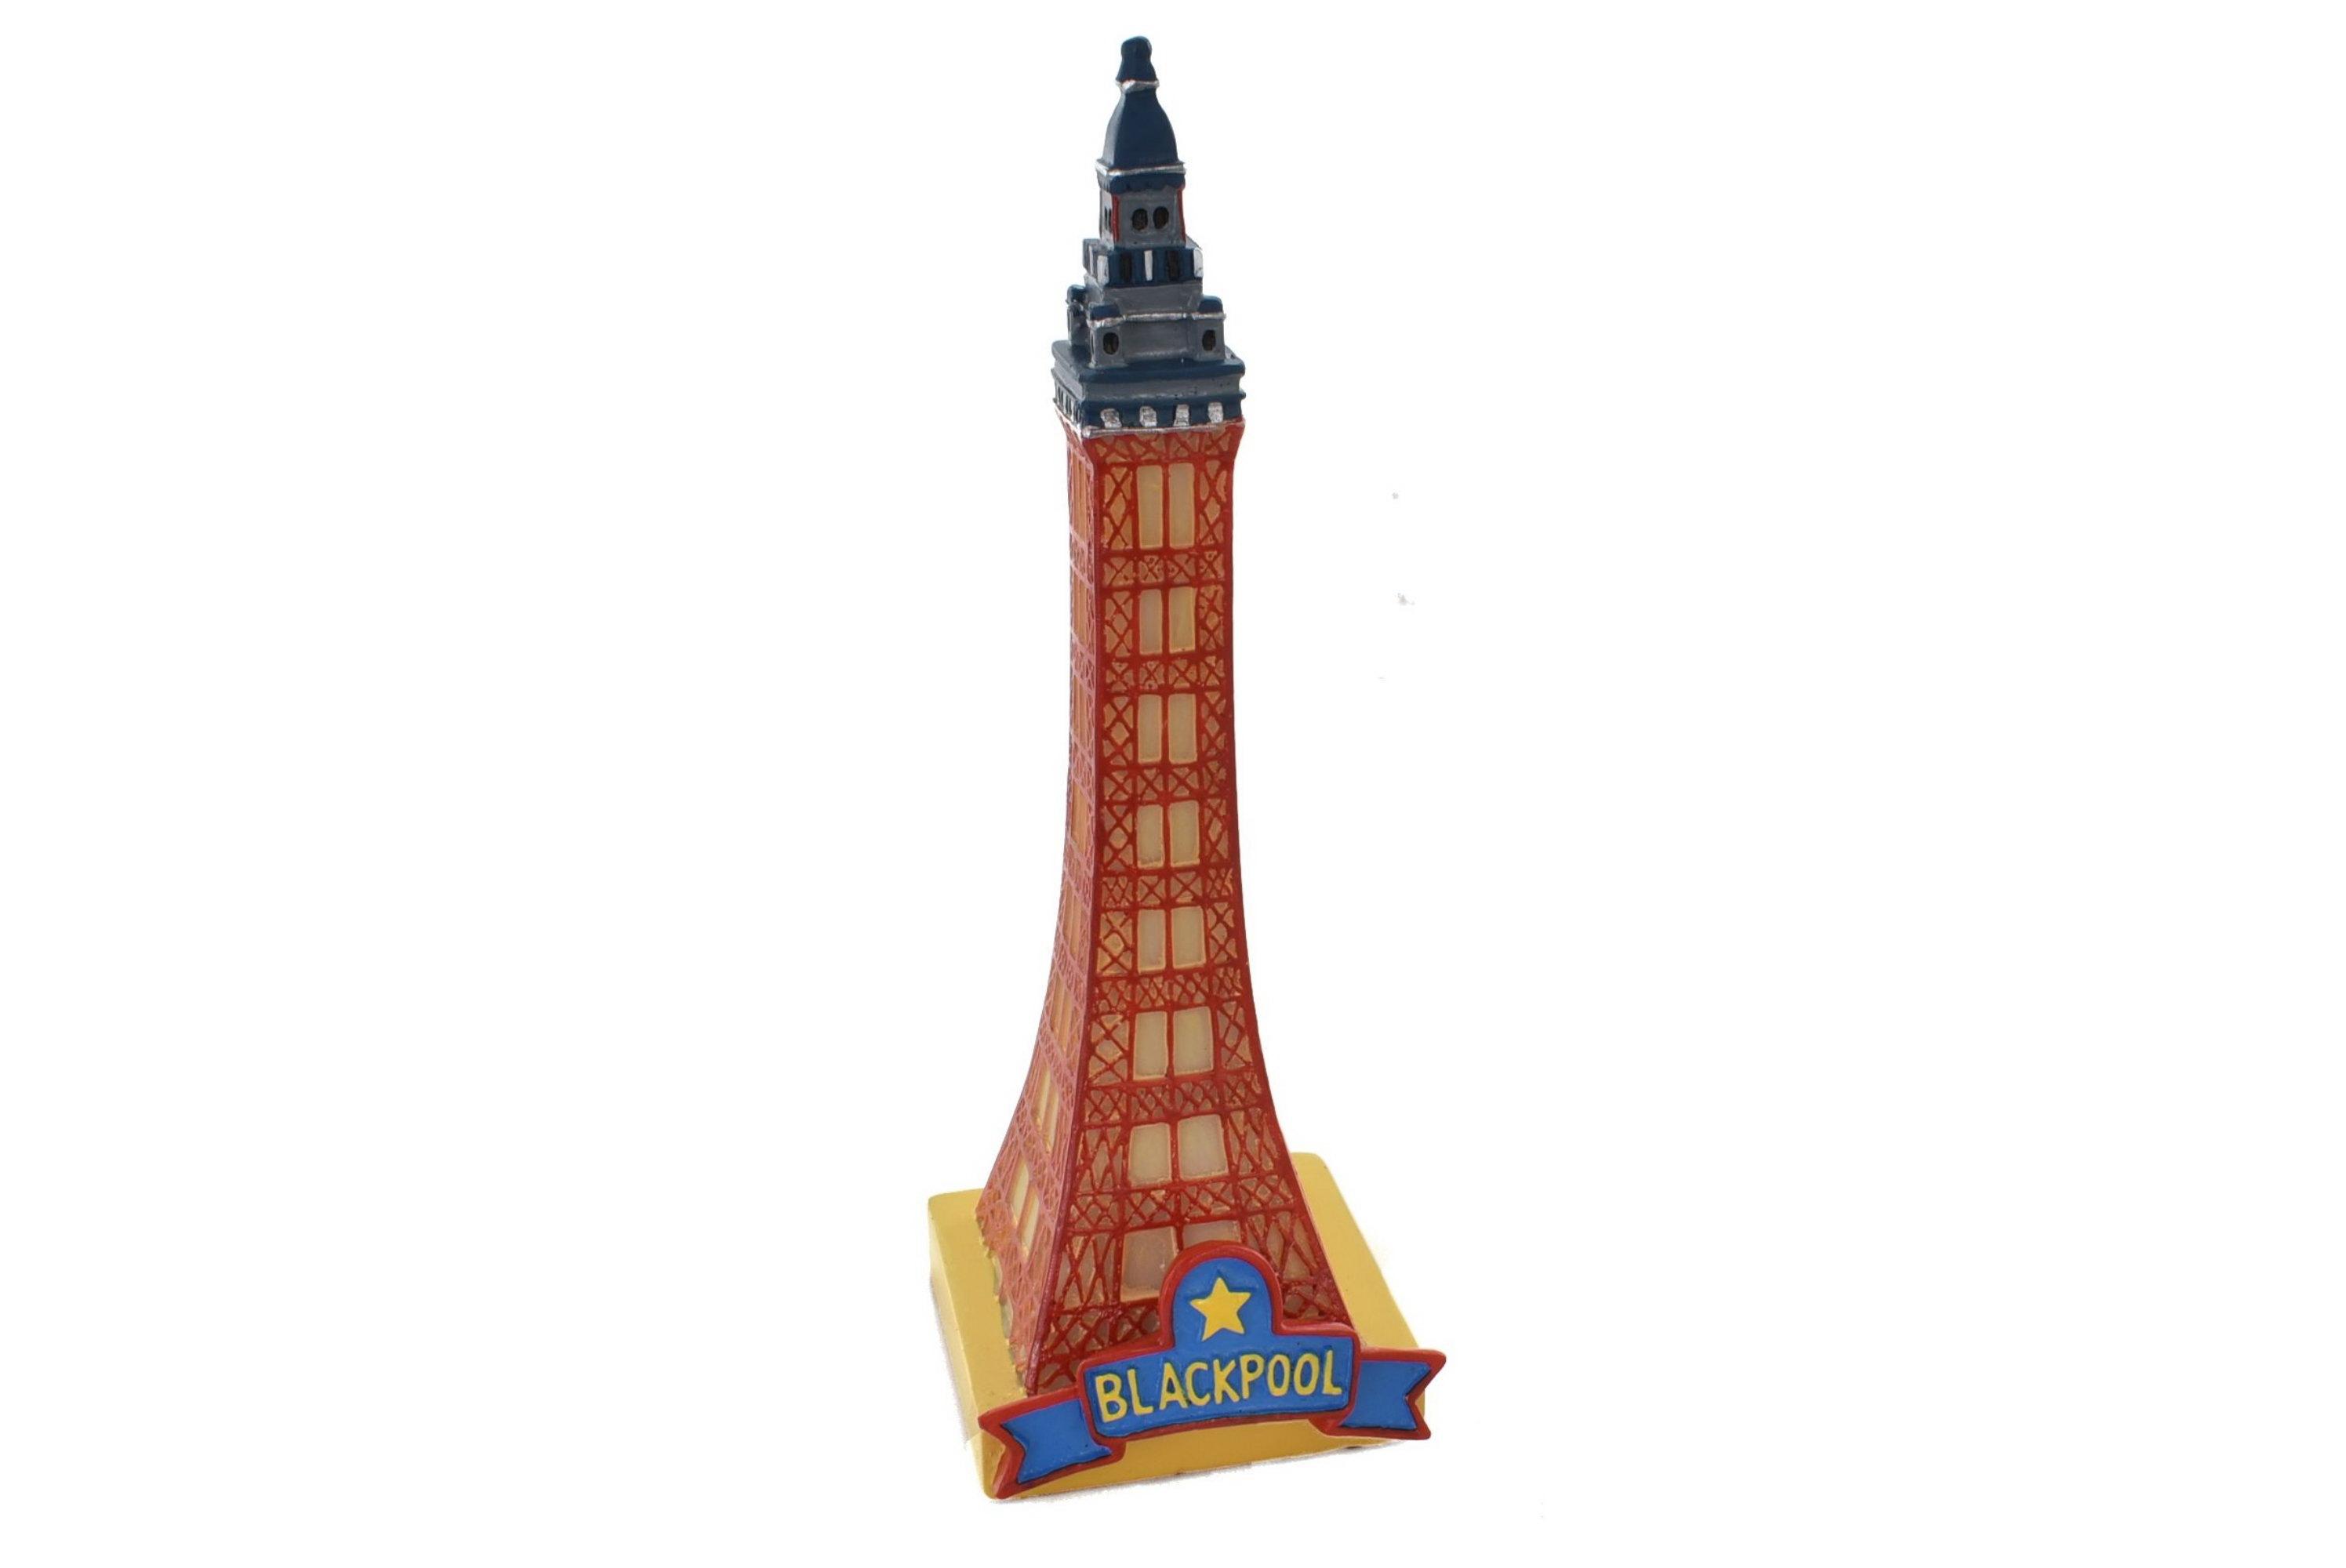 Blackpool Resin Tower 18cm